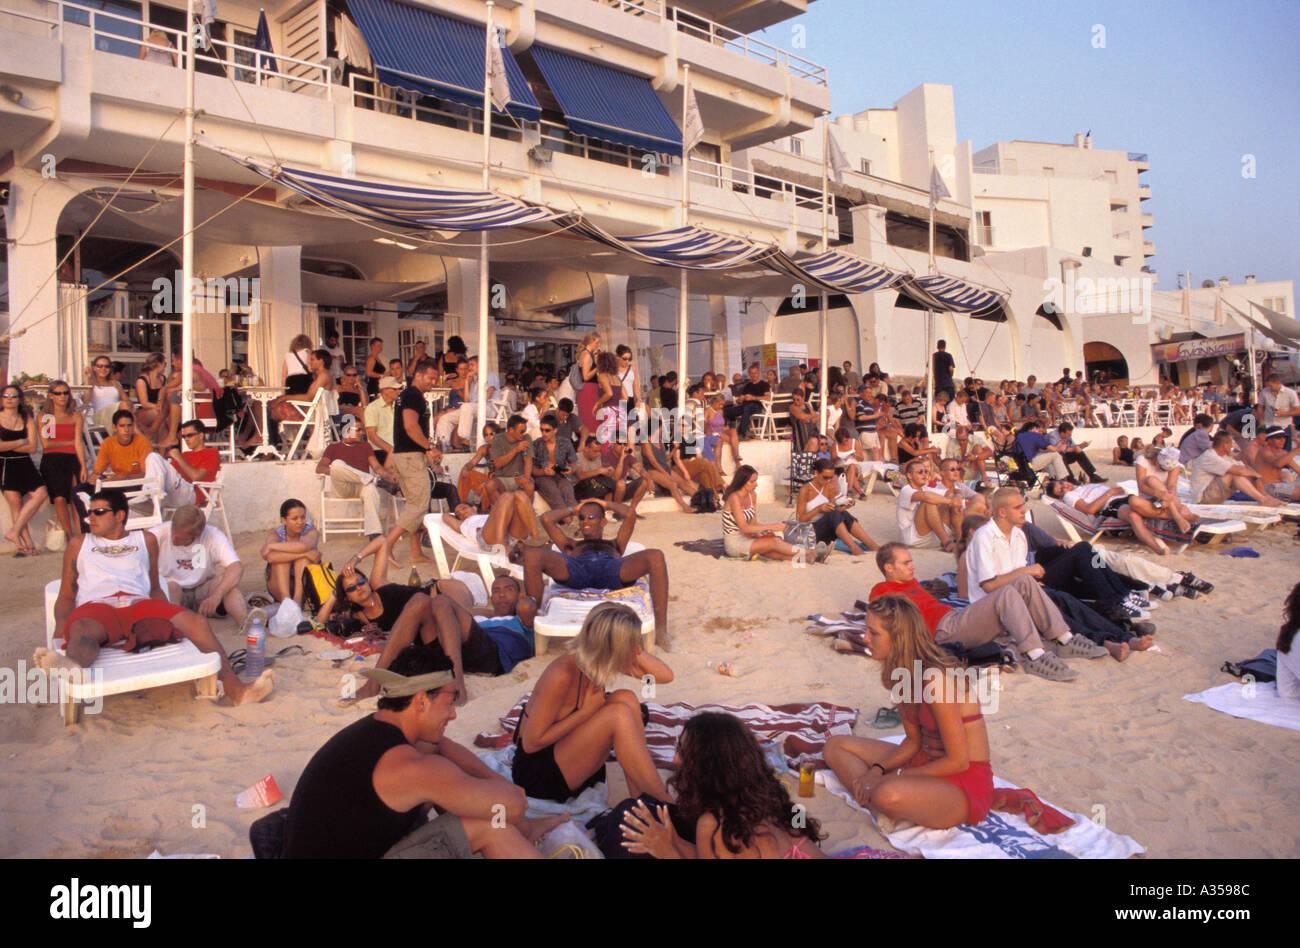 Beach in front of the Cafe del Mar in San Antonio Ibiza Spain - Stock Image